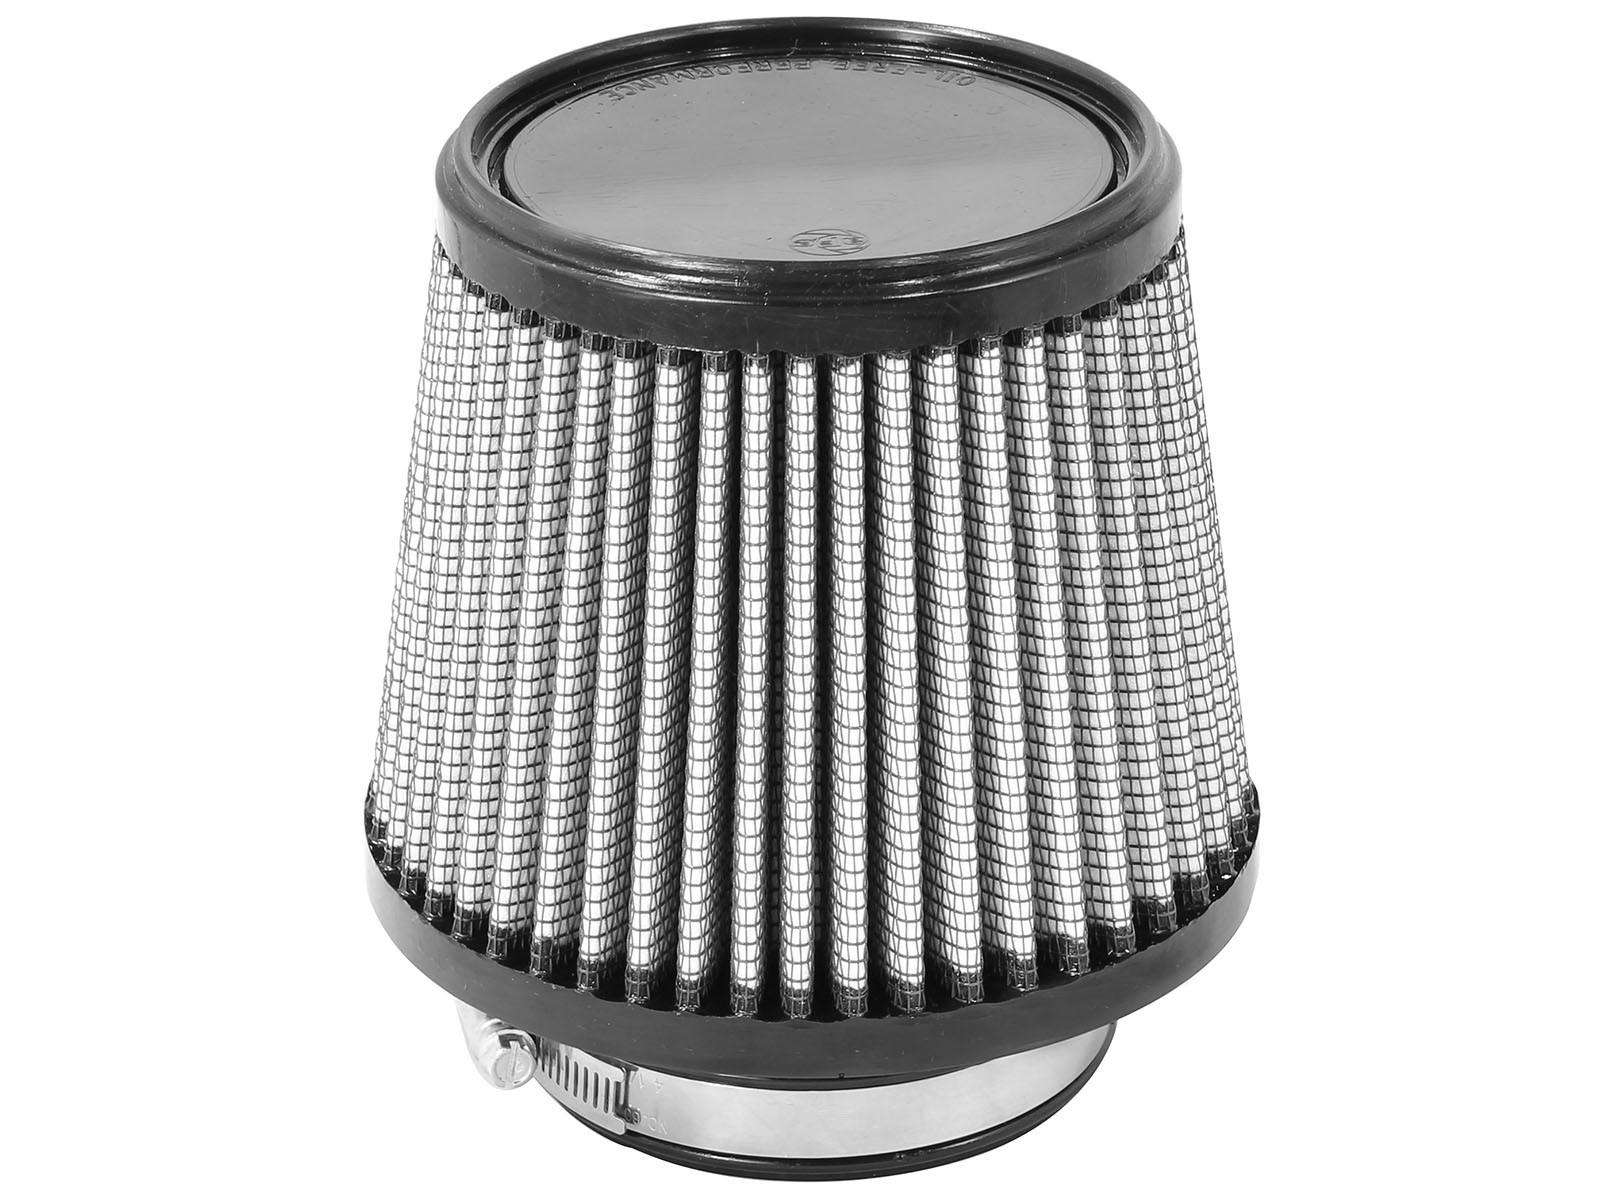 aFe POWER 21-35009 Magnum FLOW Pro DRY S Air Filter